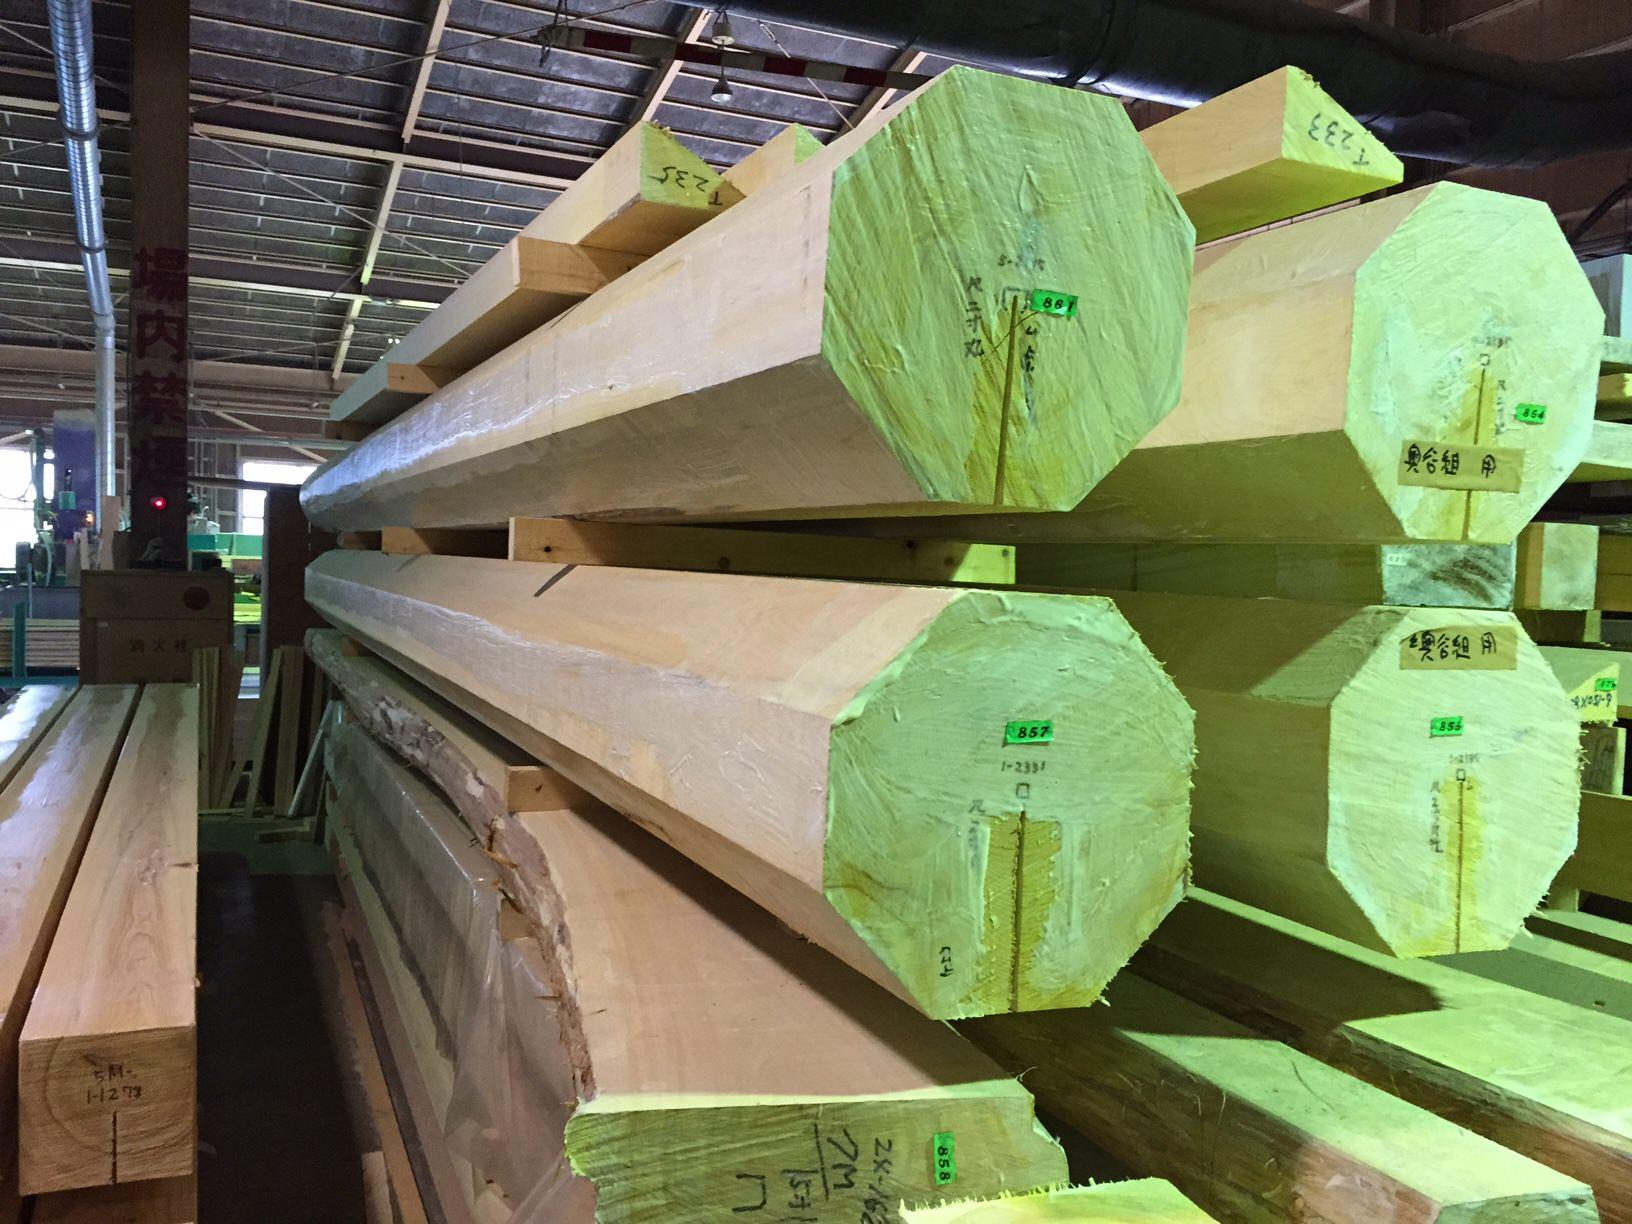 桑原木材の工場視察